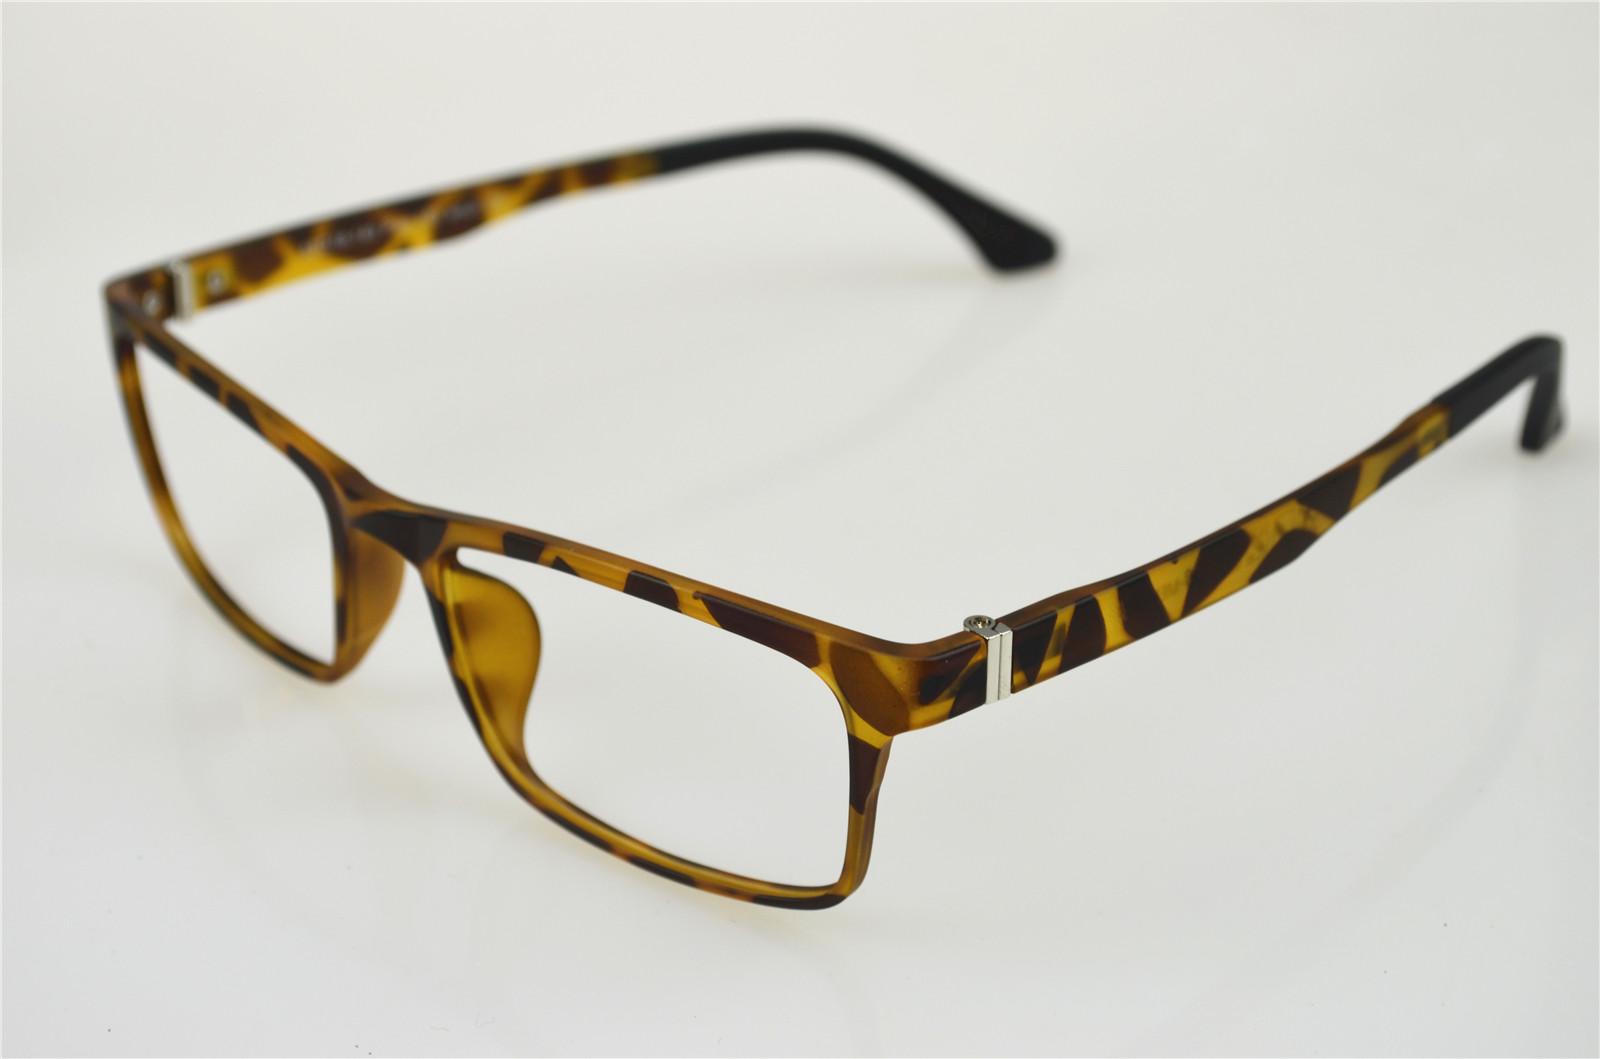 Prescription Glasses Frame Types : Fashion Optical Glasses Frames Men Super Light ...